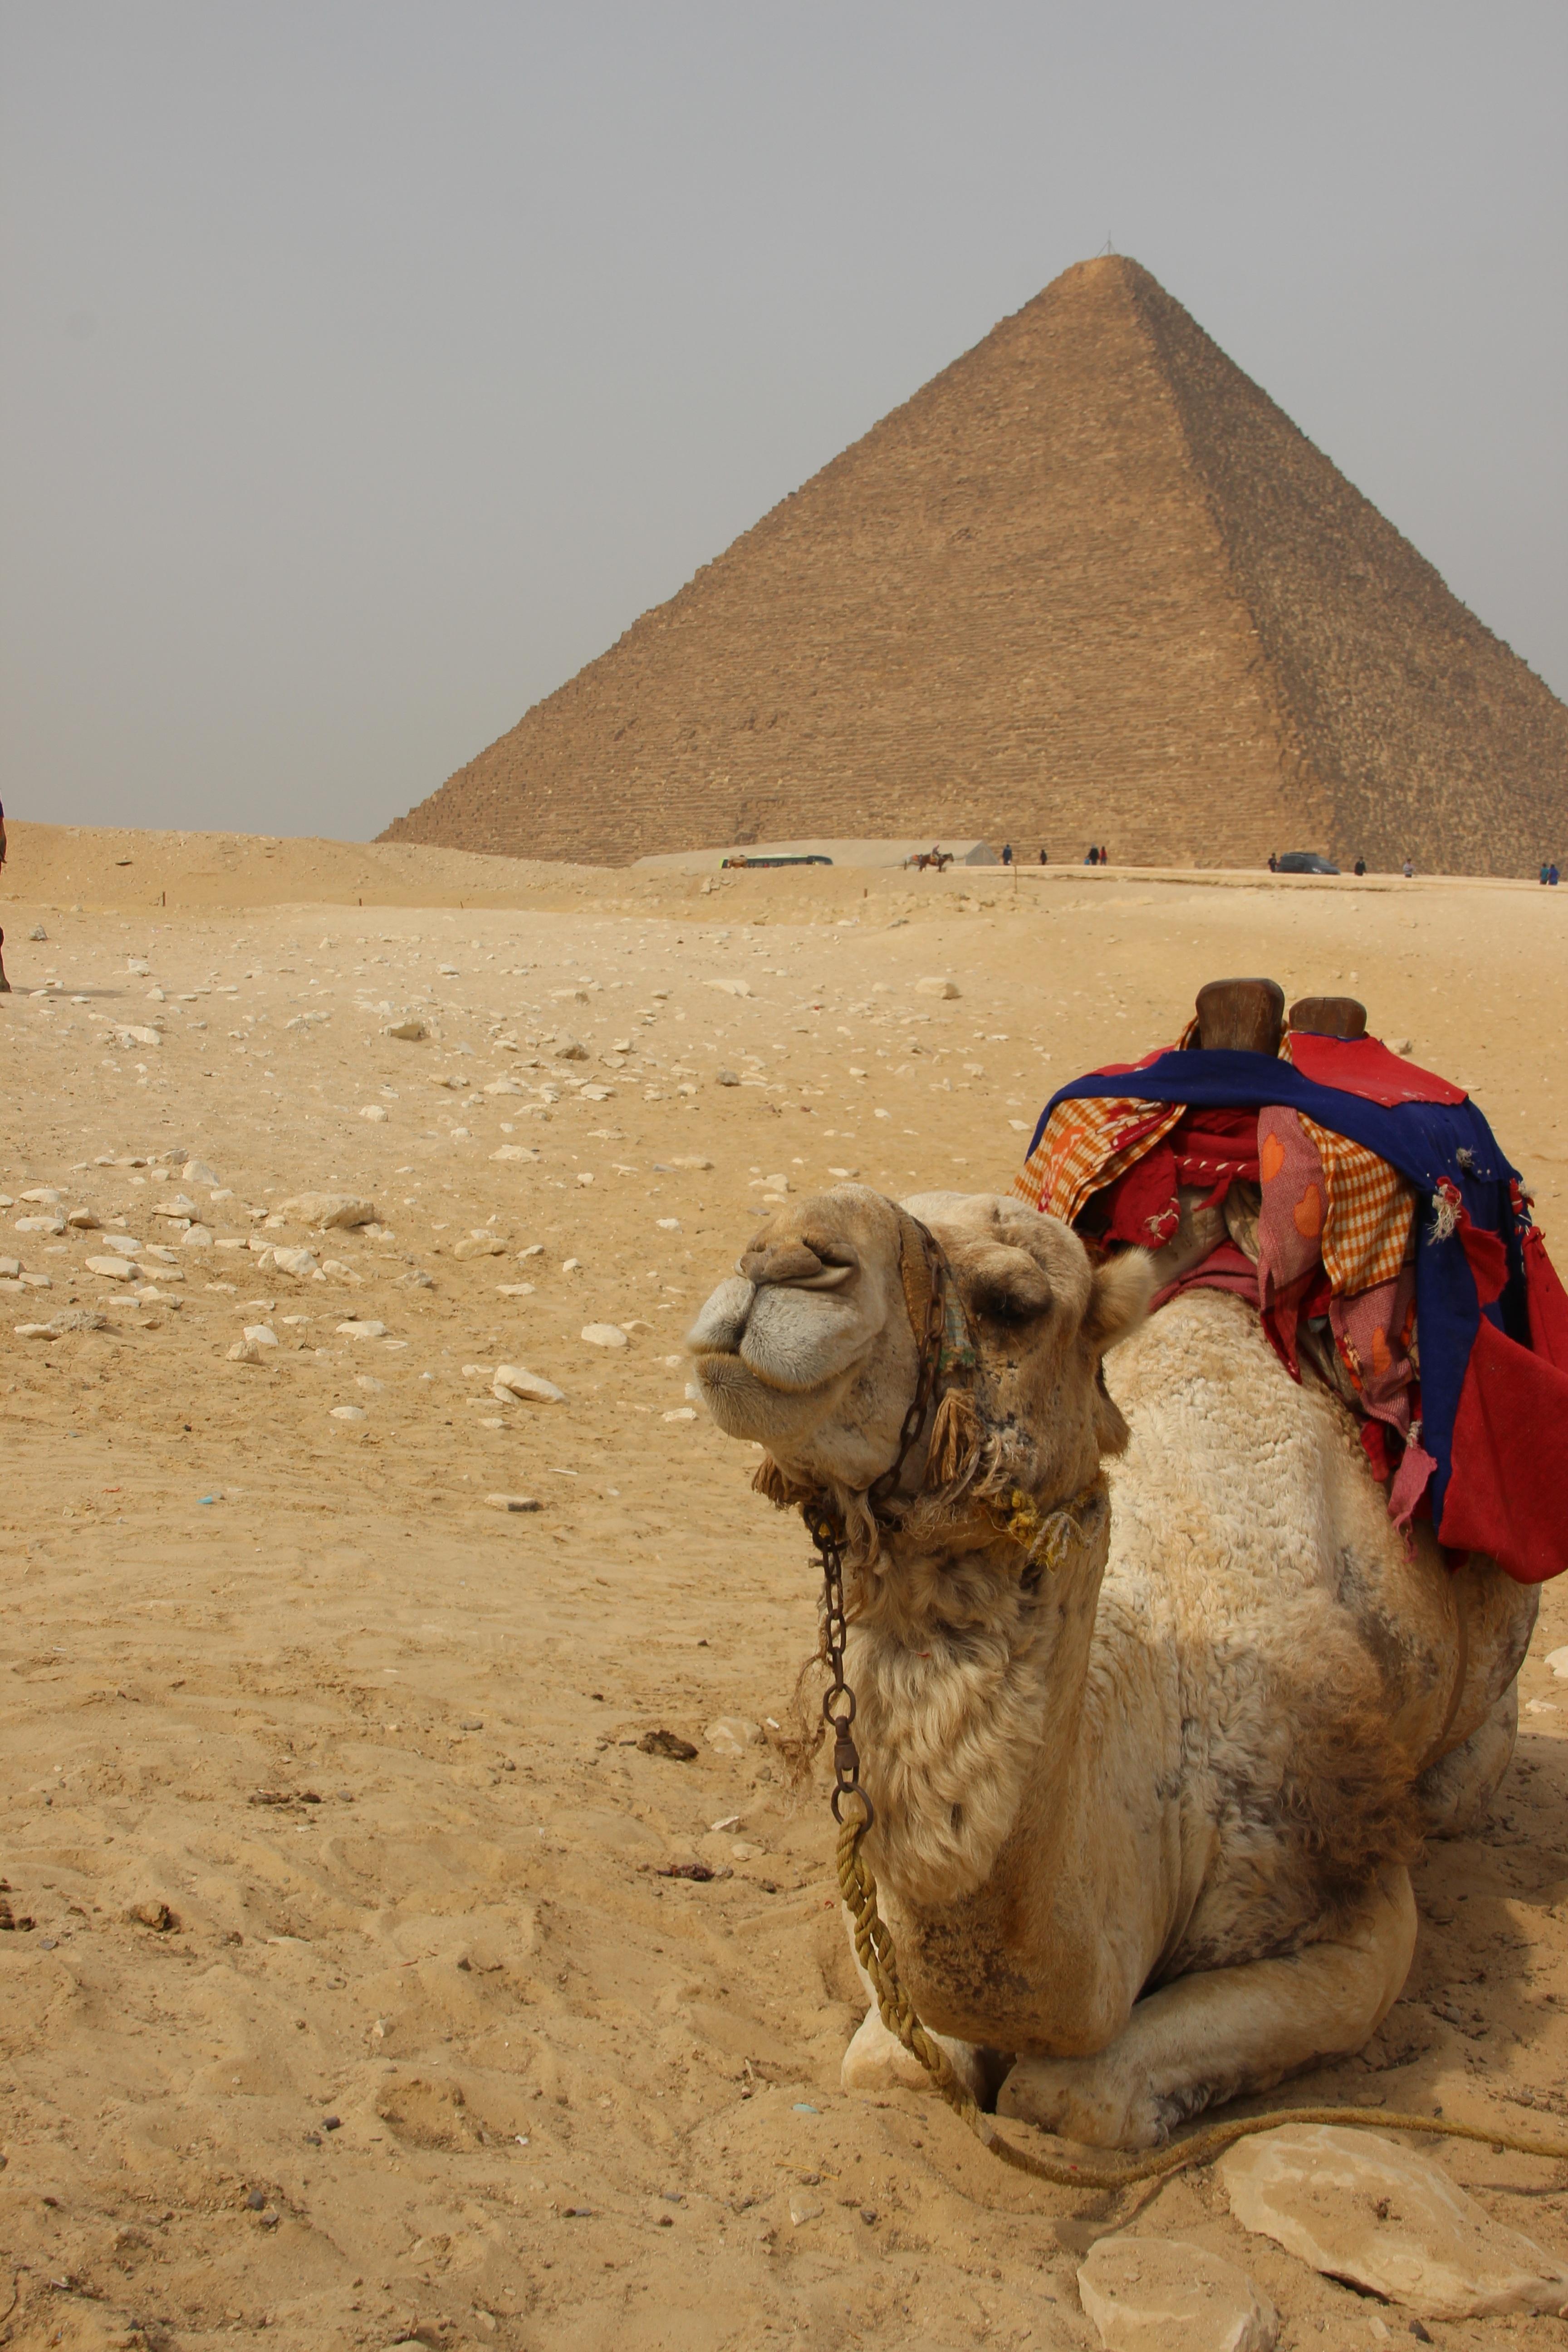 Gambar Pemandangan Pasir Gurun Monumen Piramida Afrika